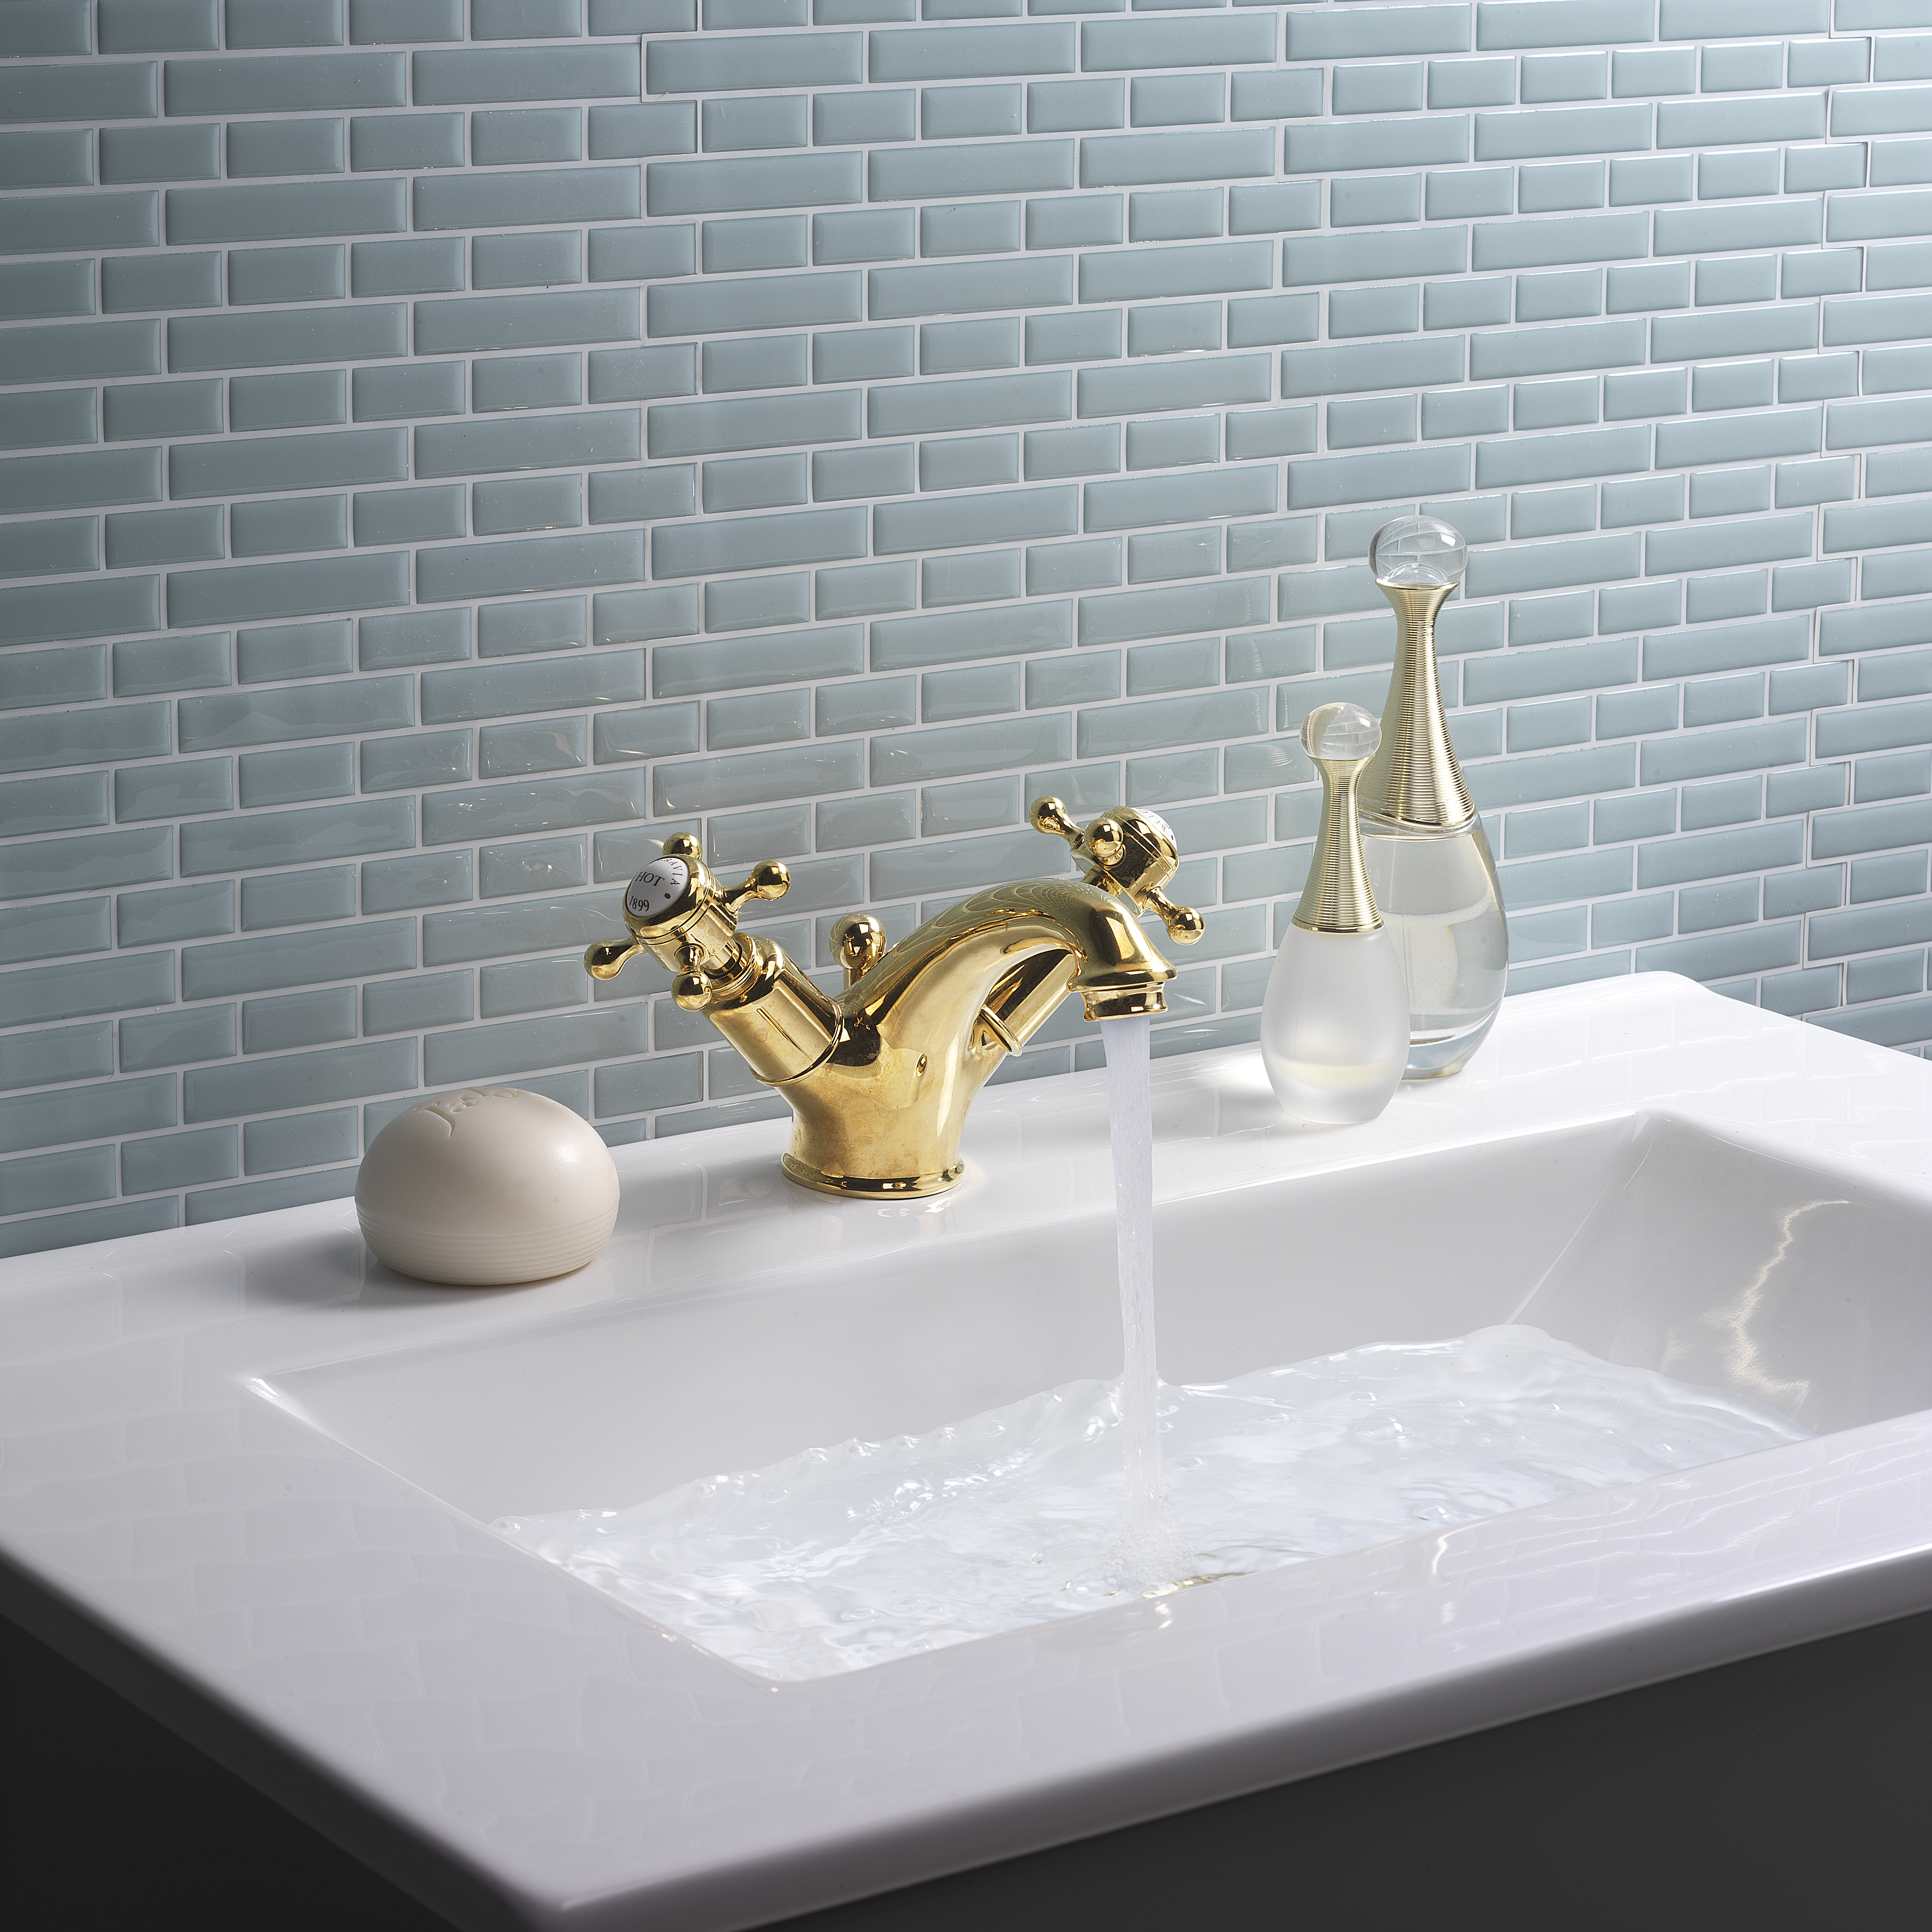 Crosswater blue tiled bathroom with brass taps interior design